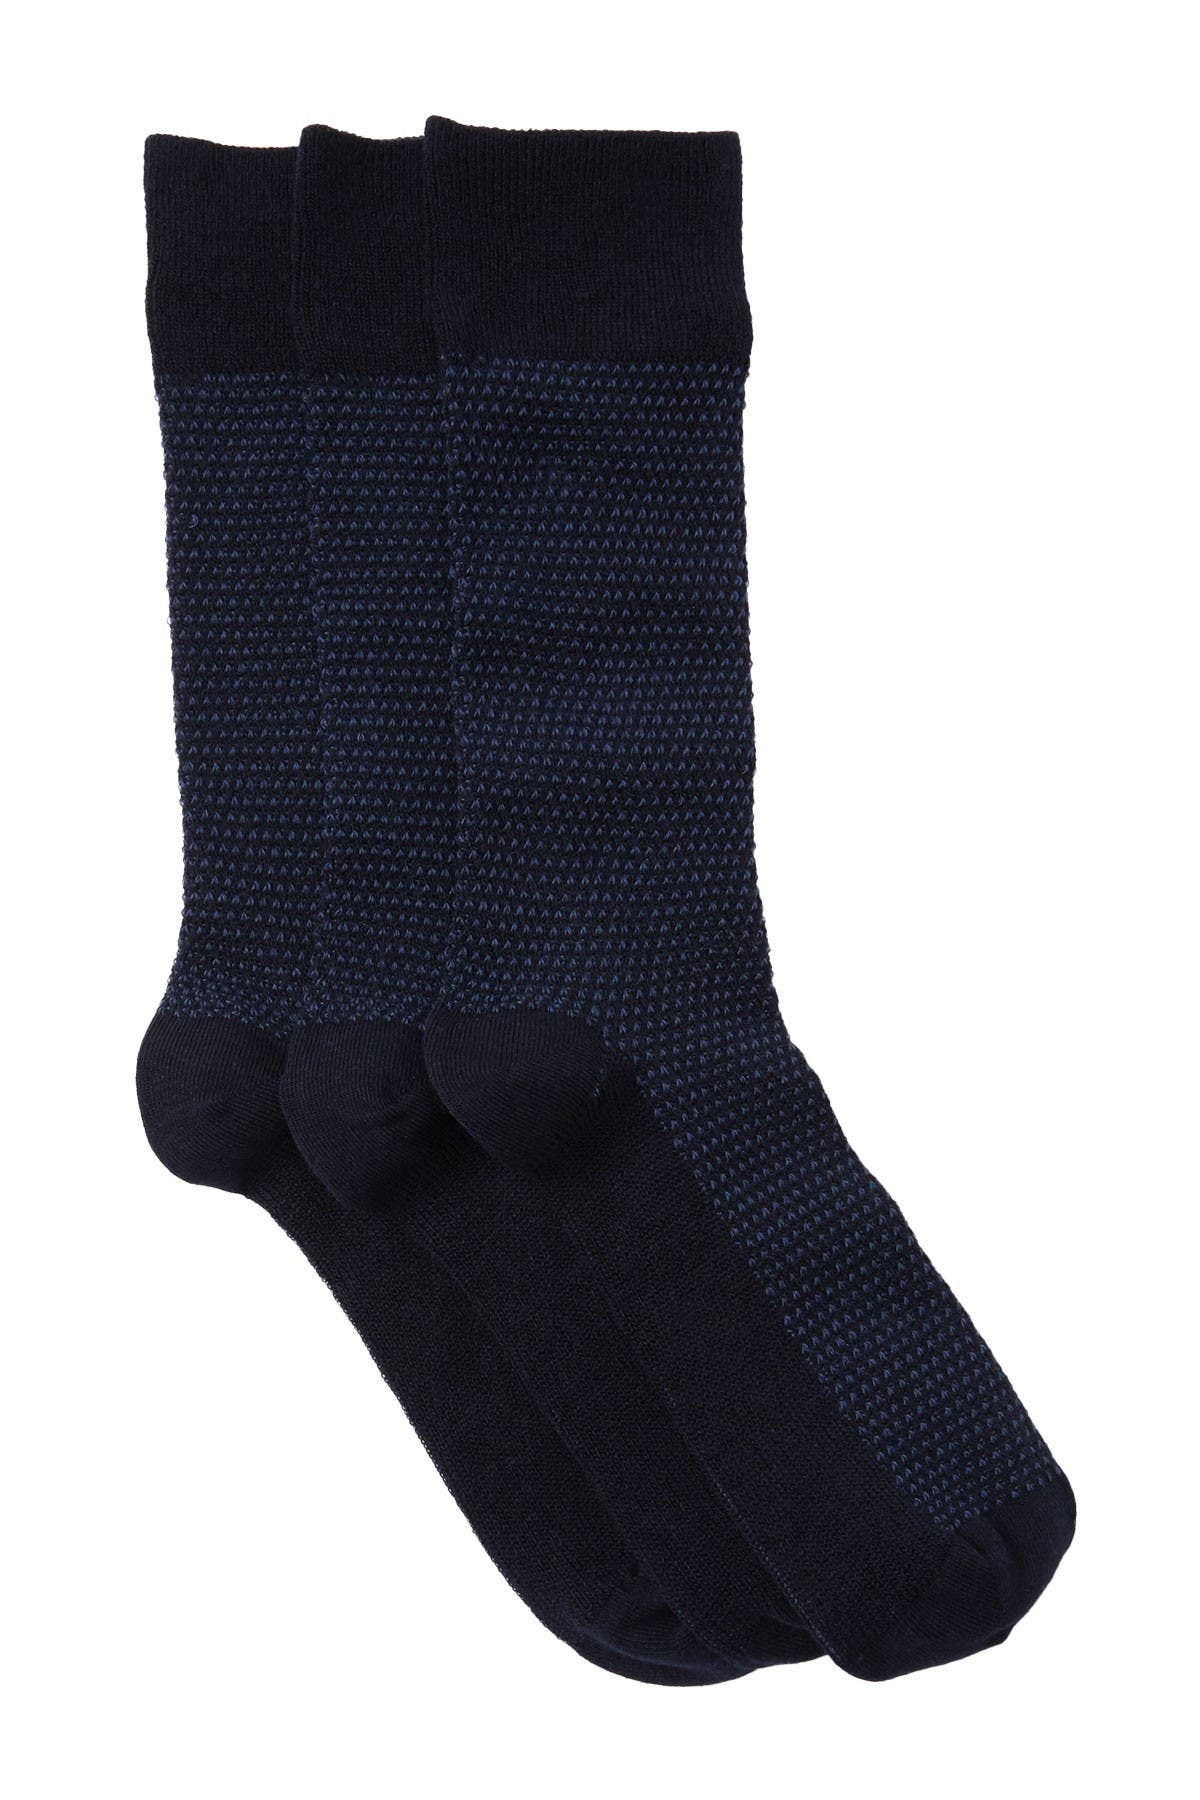 Image of Nordstrom Rack Knit Crew Socks - Pack of 3